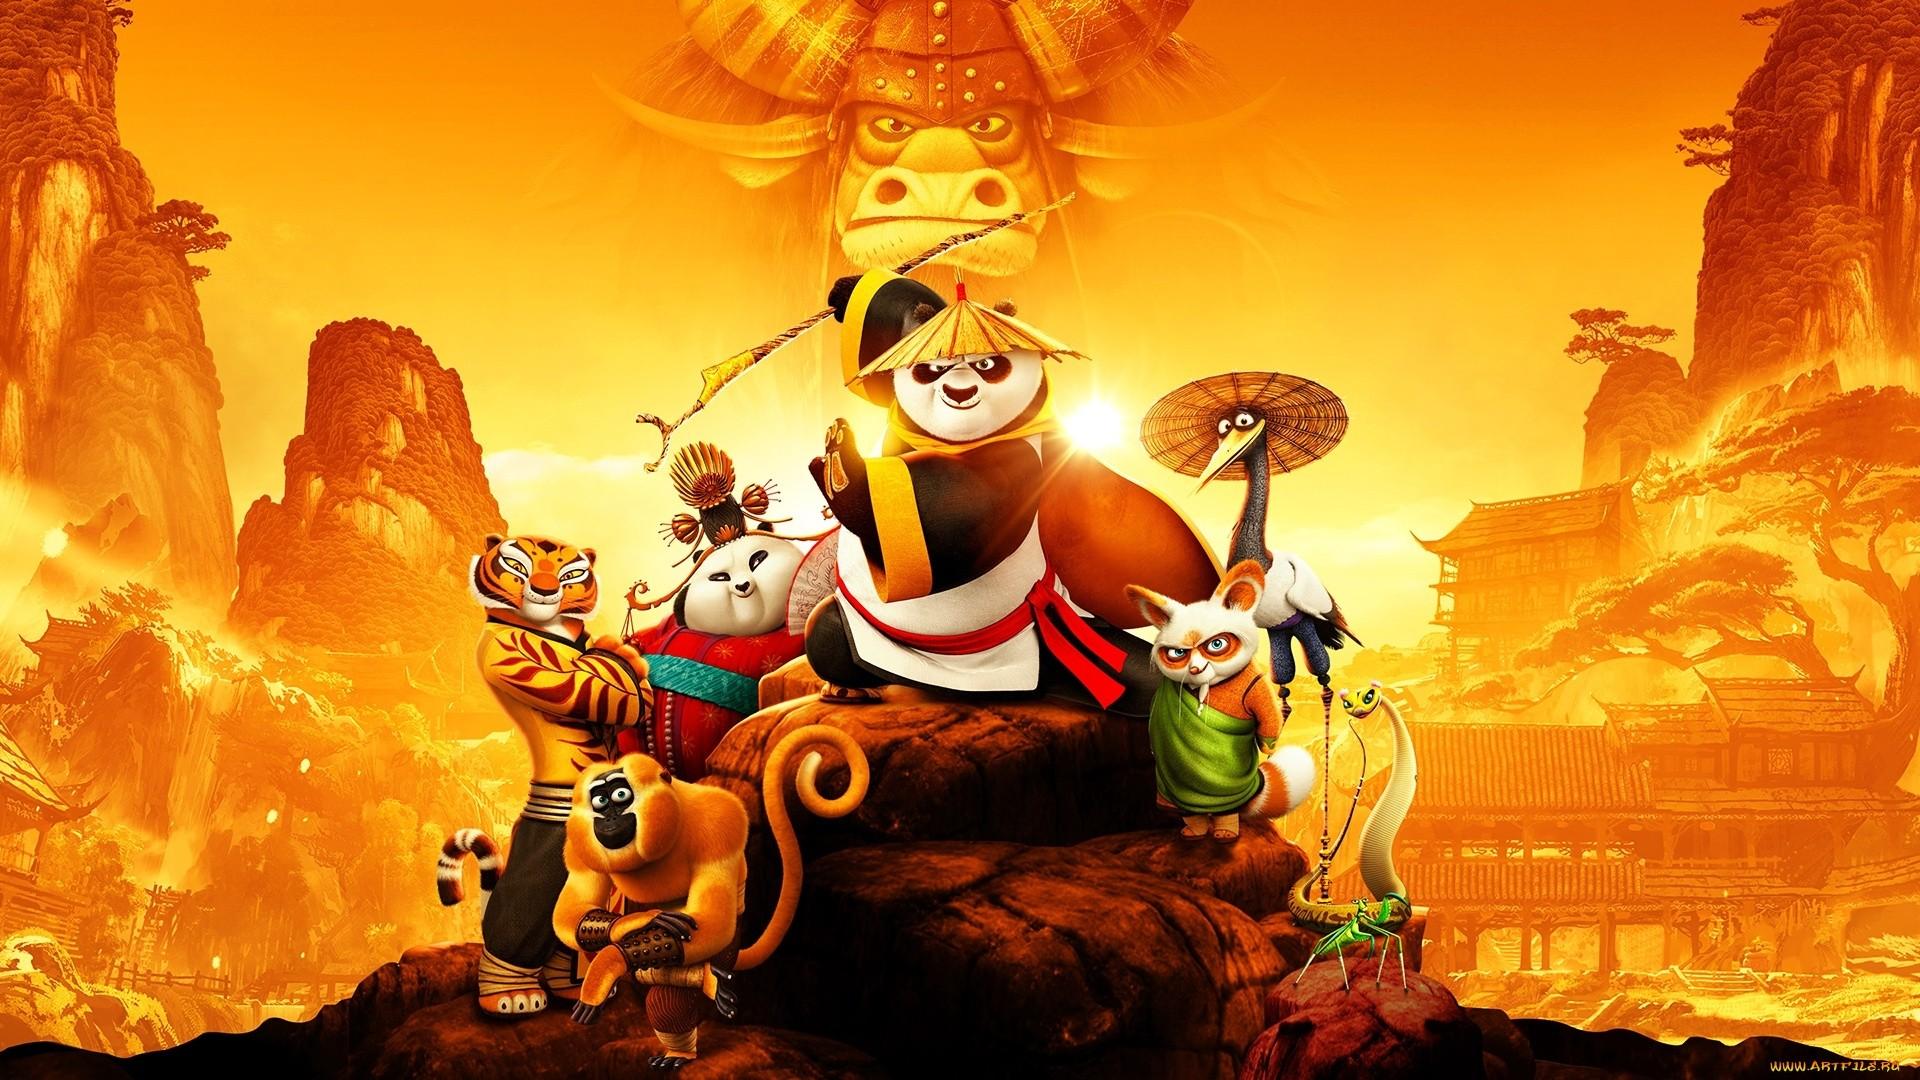 Kung Fu Panda good wallpaper hd